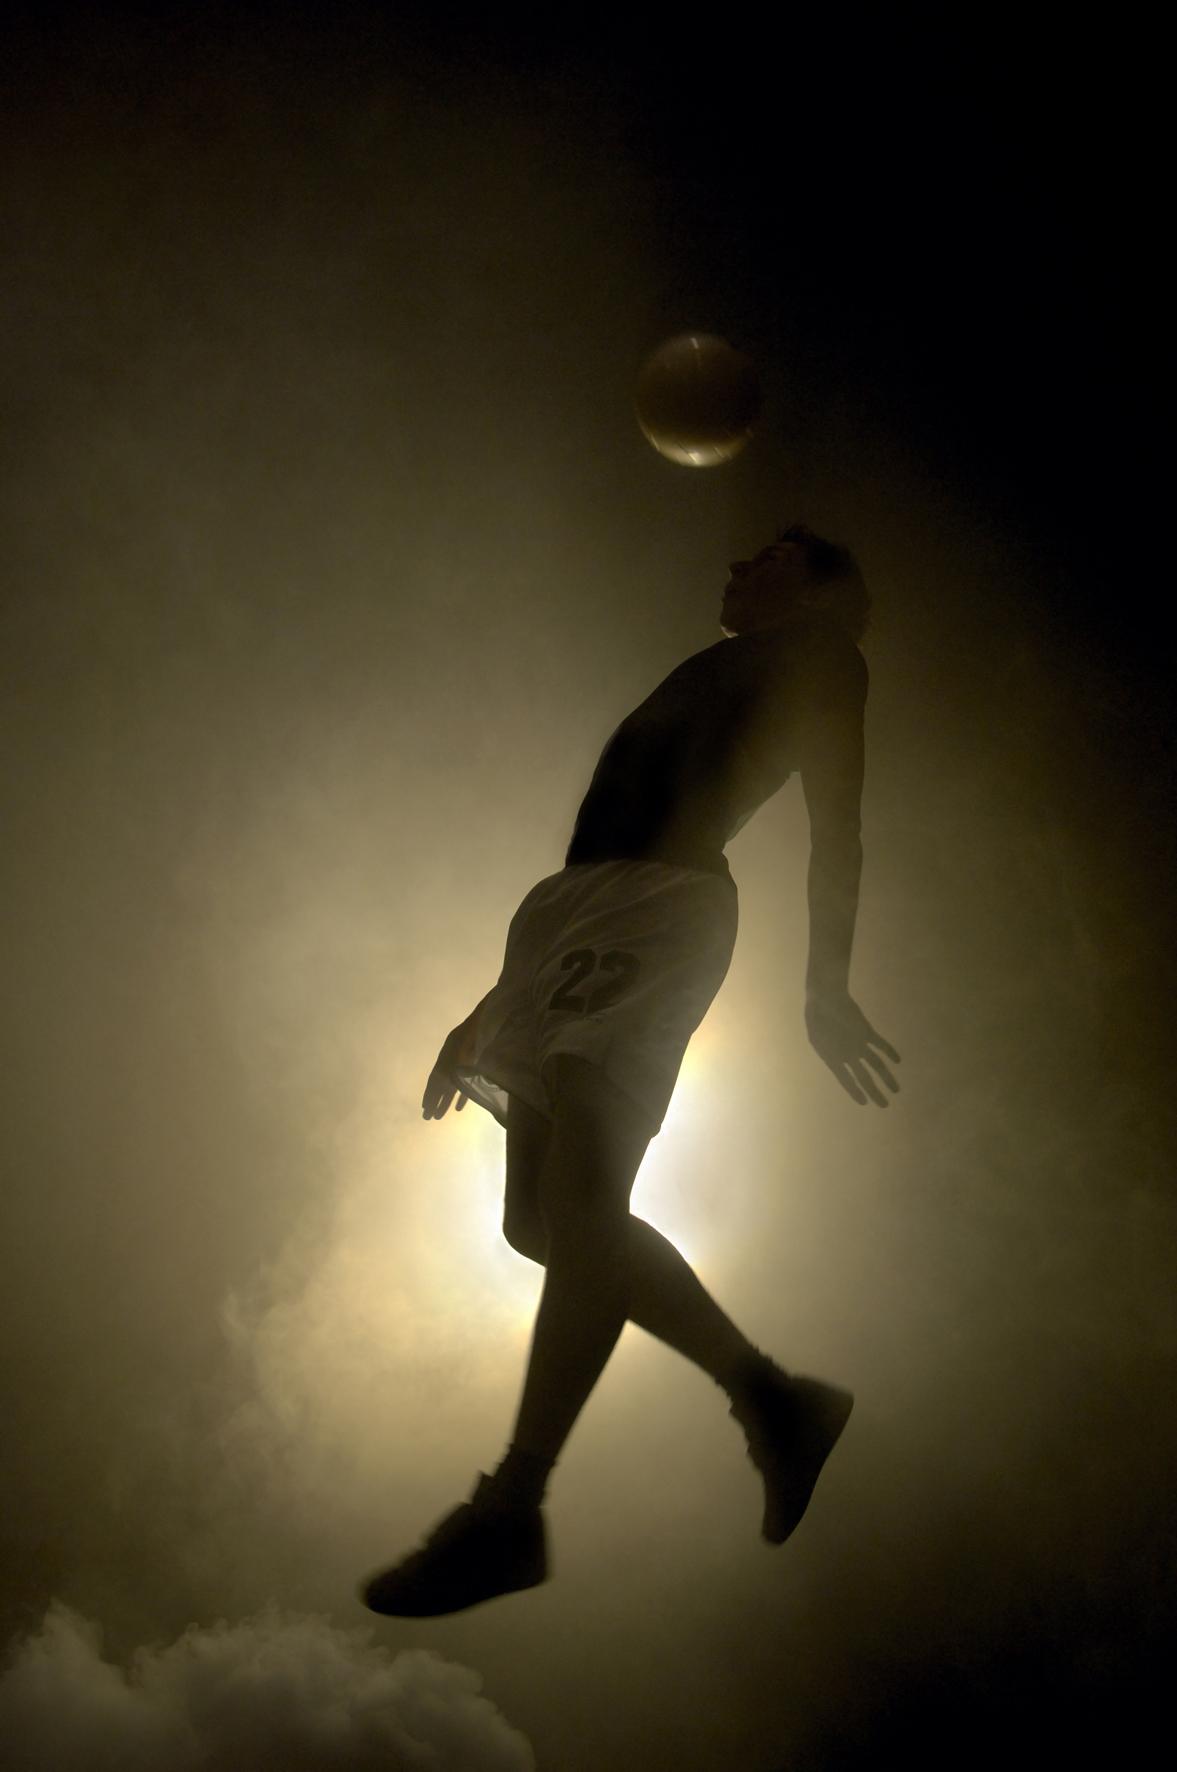 Mark Jan Fledderus Footbal player